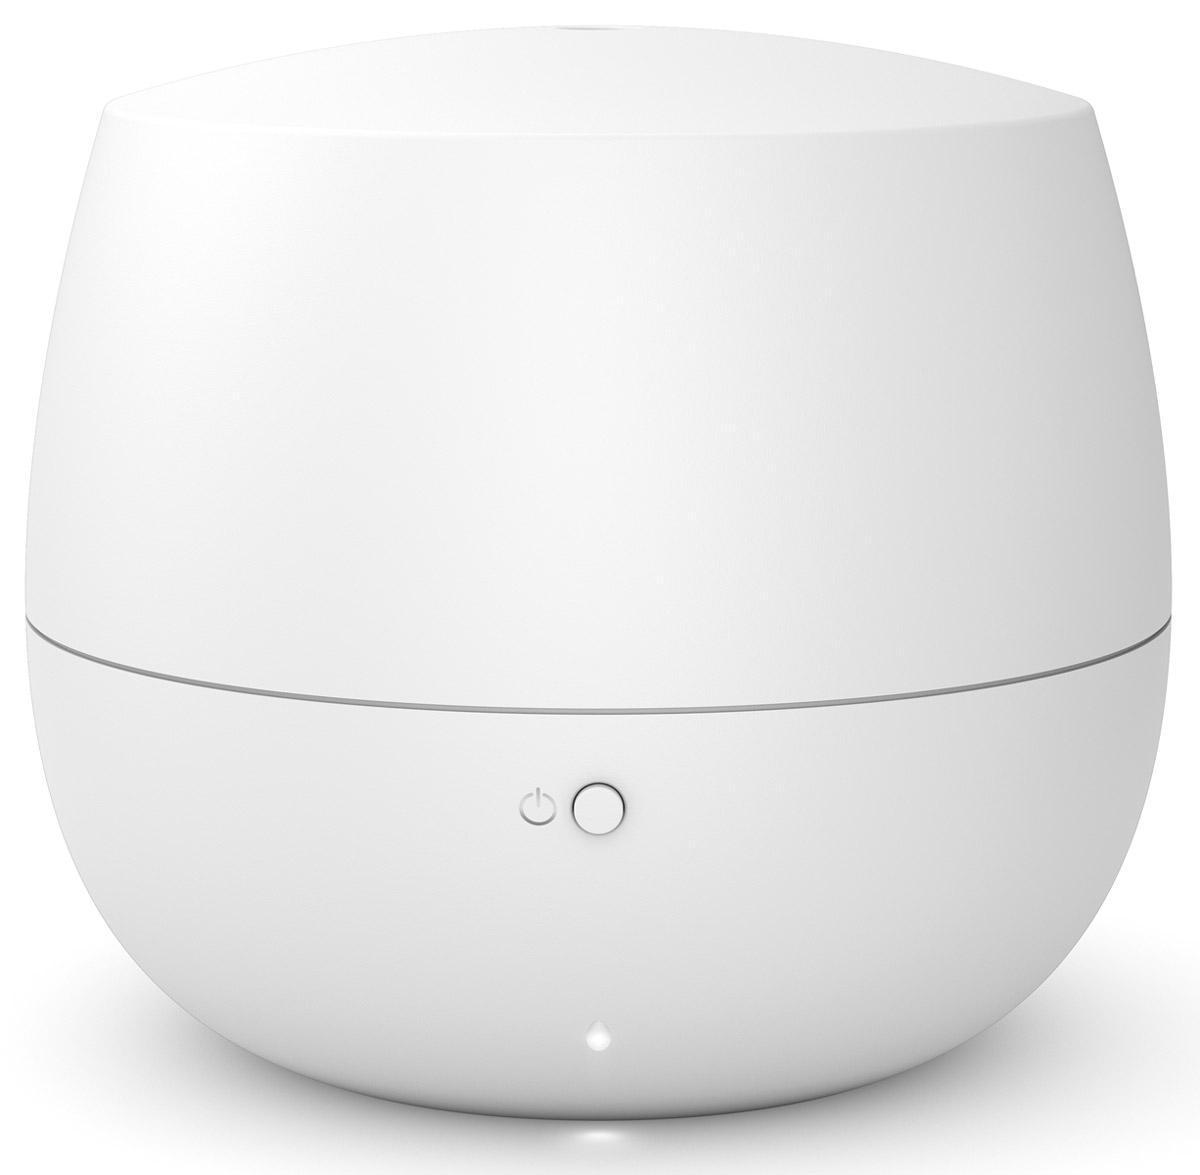 Stadler Form Mia, White ароматизатор воздуха00000051231